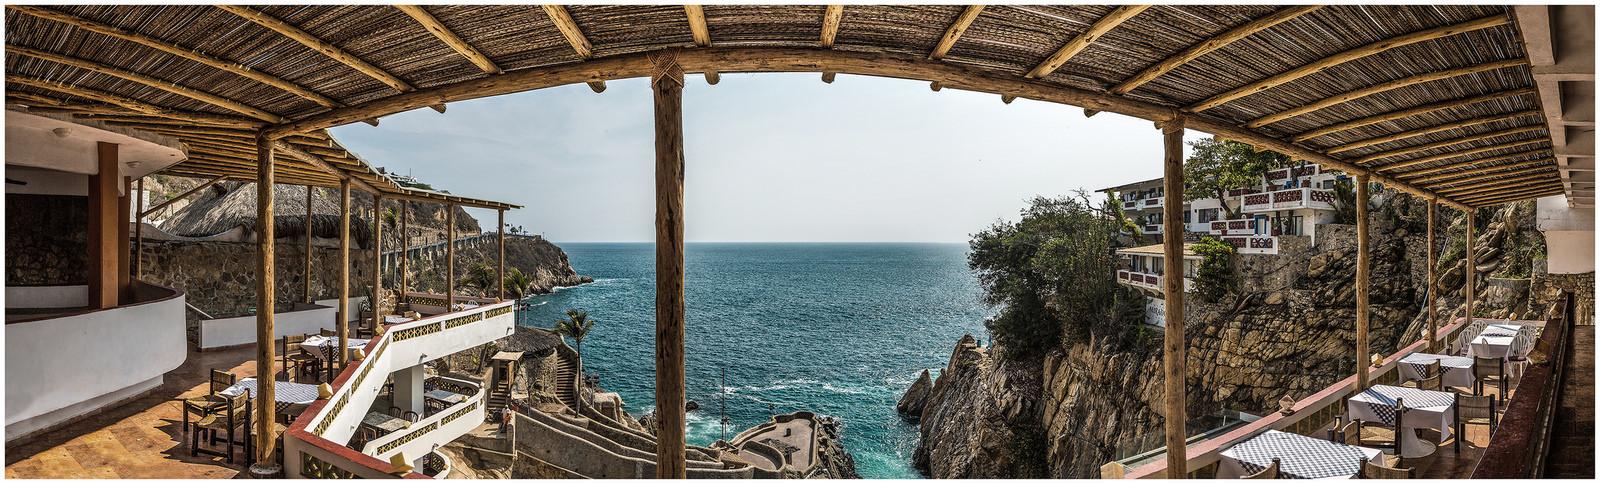 Acapulco-La-Quebrada-Richard-Cawood